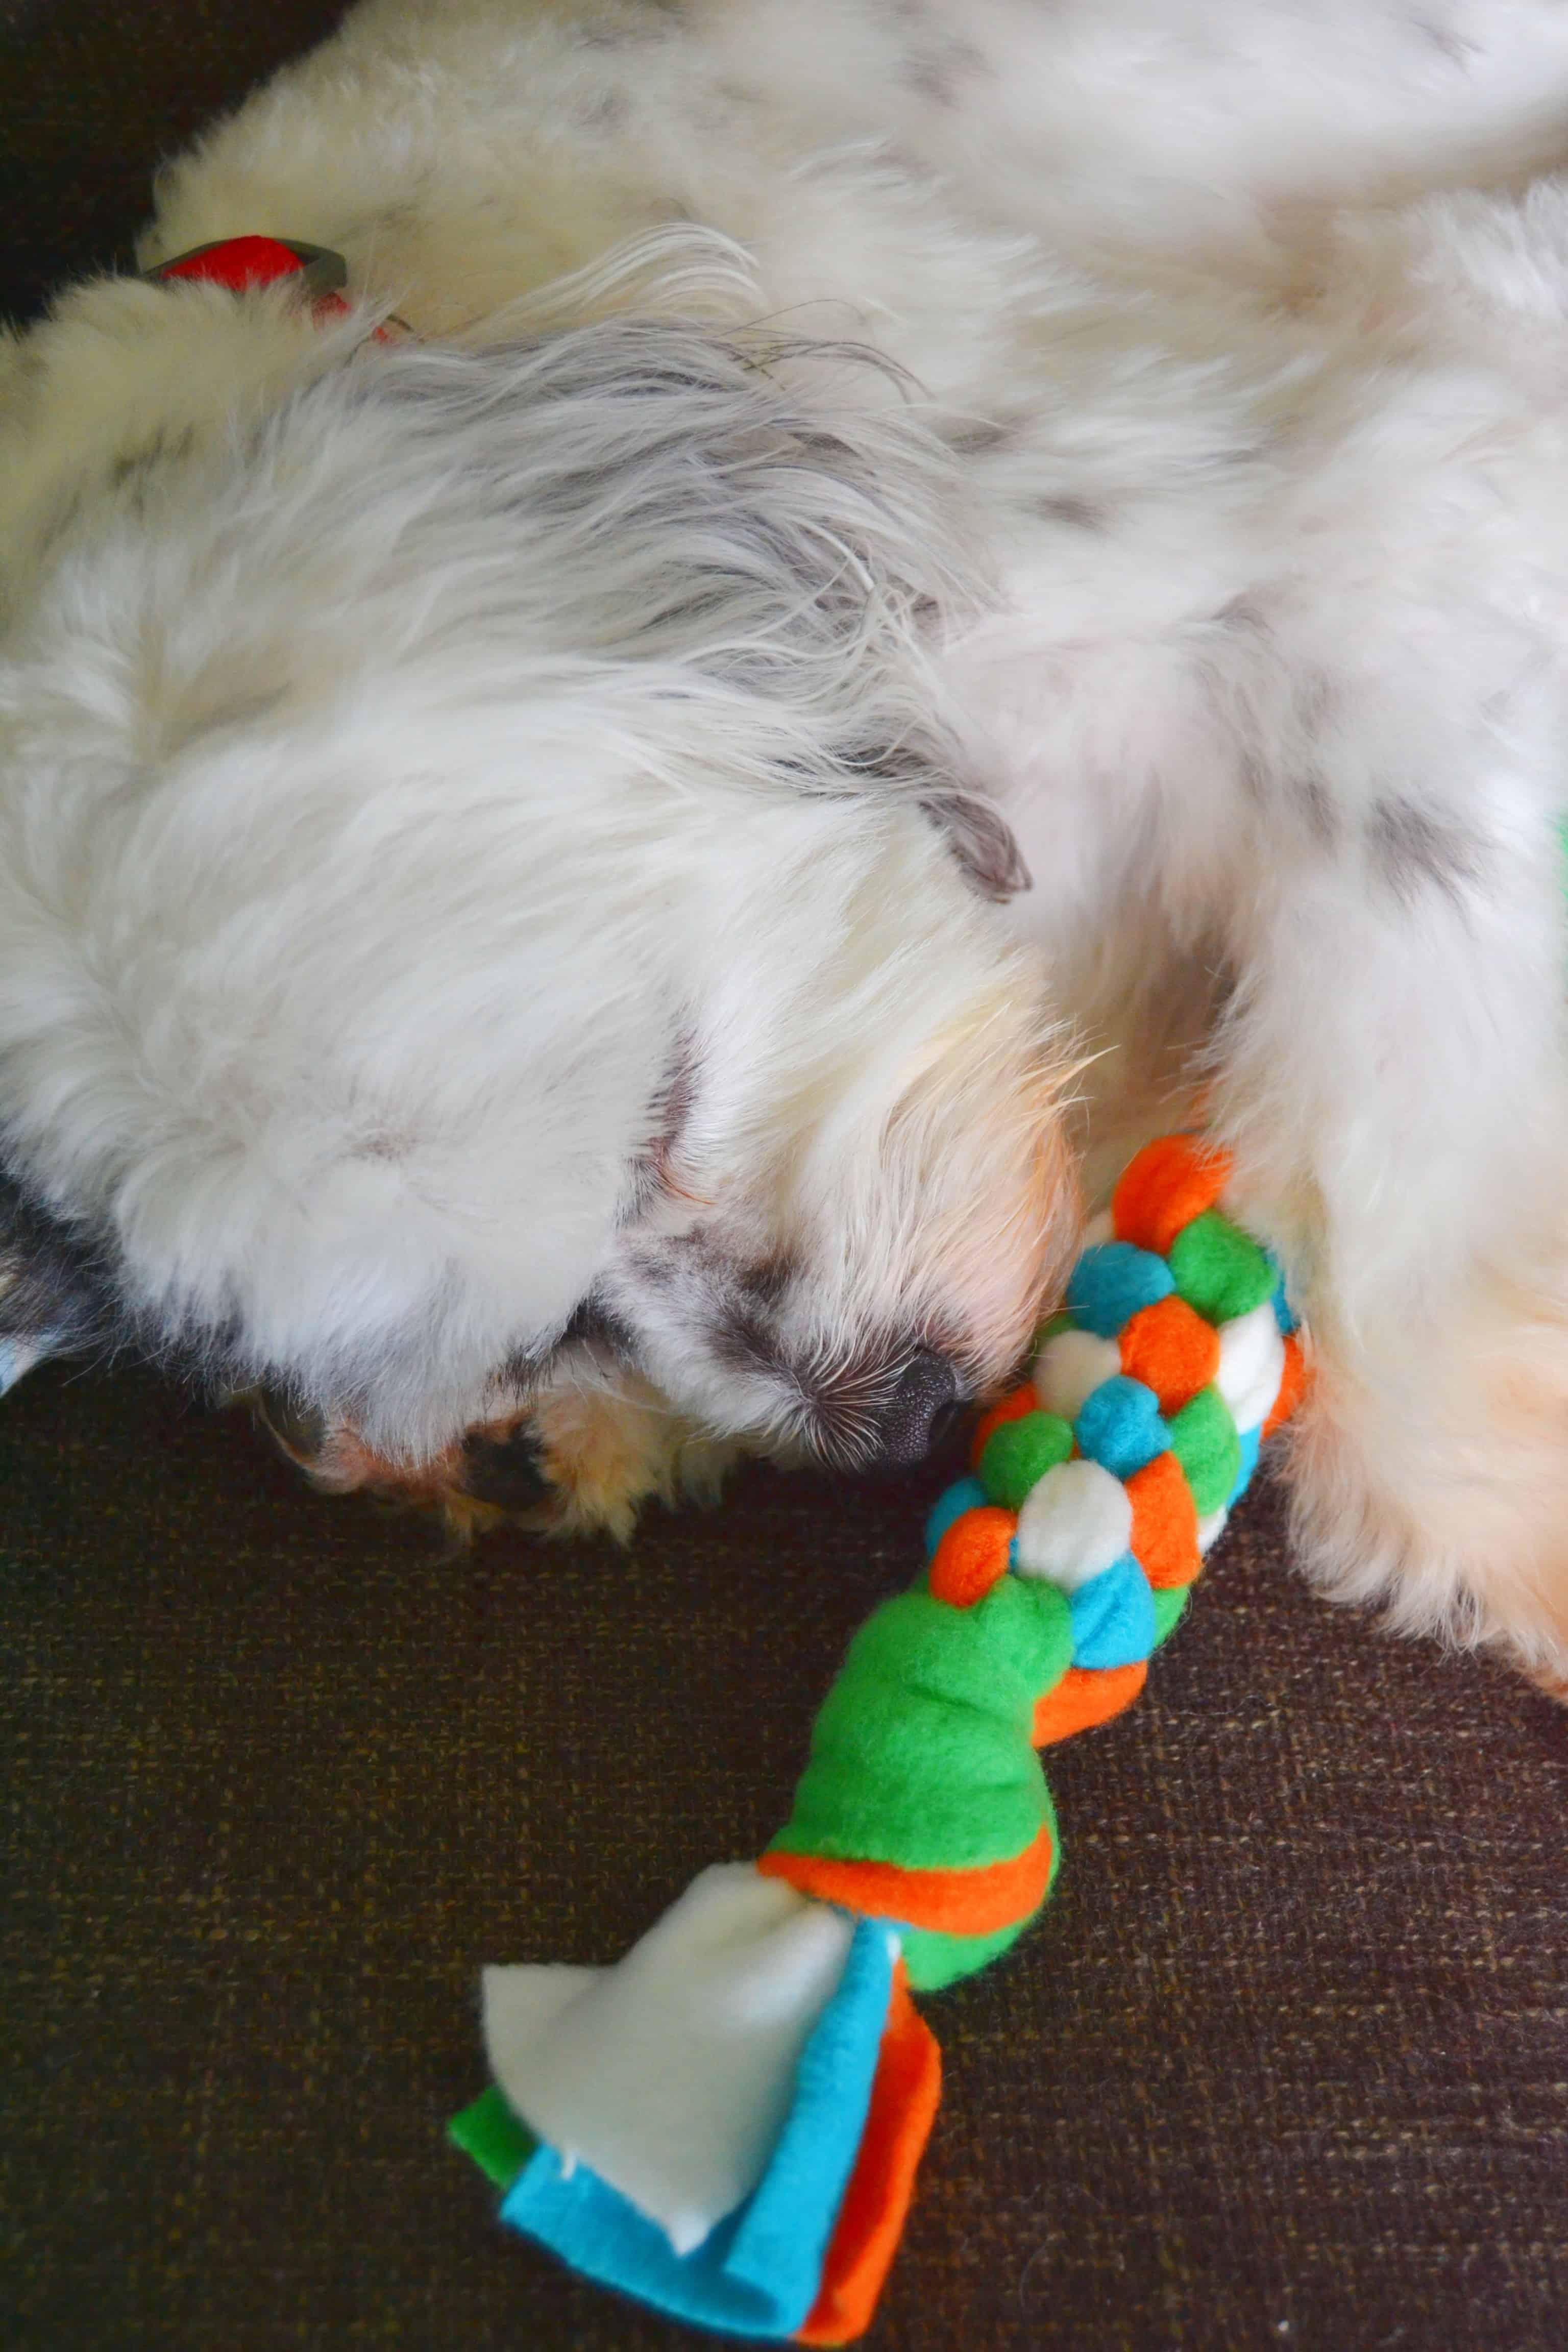 fluffy white dog snuggling the fleece dog toy